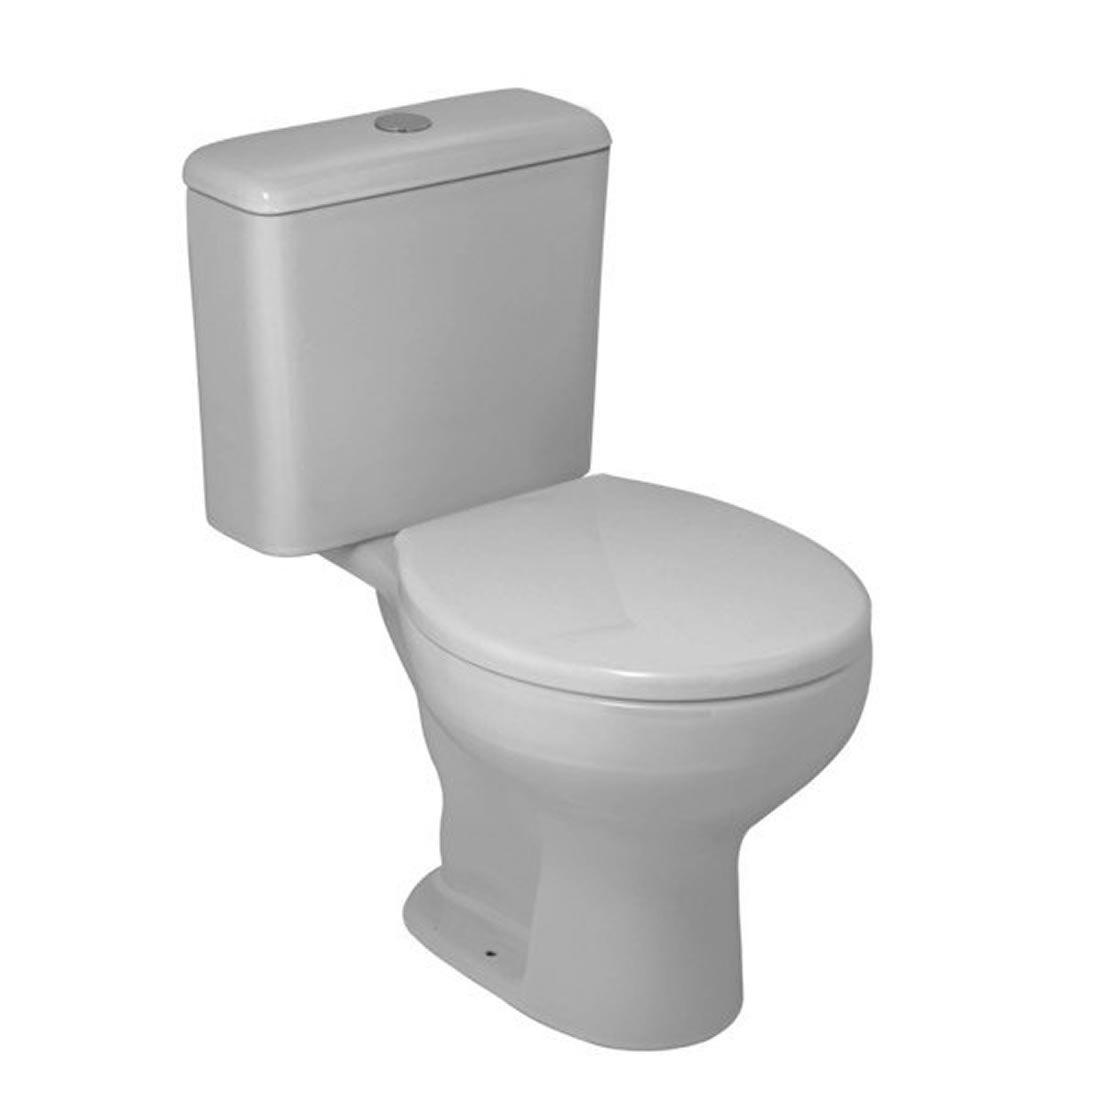 Conjunto Vaso Sanitário com Caixa Acoplada 3/6L Ecoflush Azaleia Cinza Prata Celite